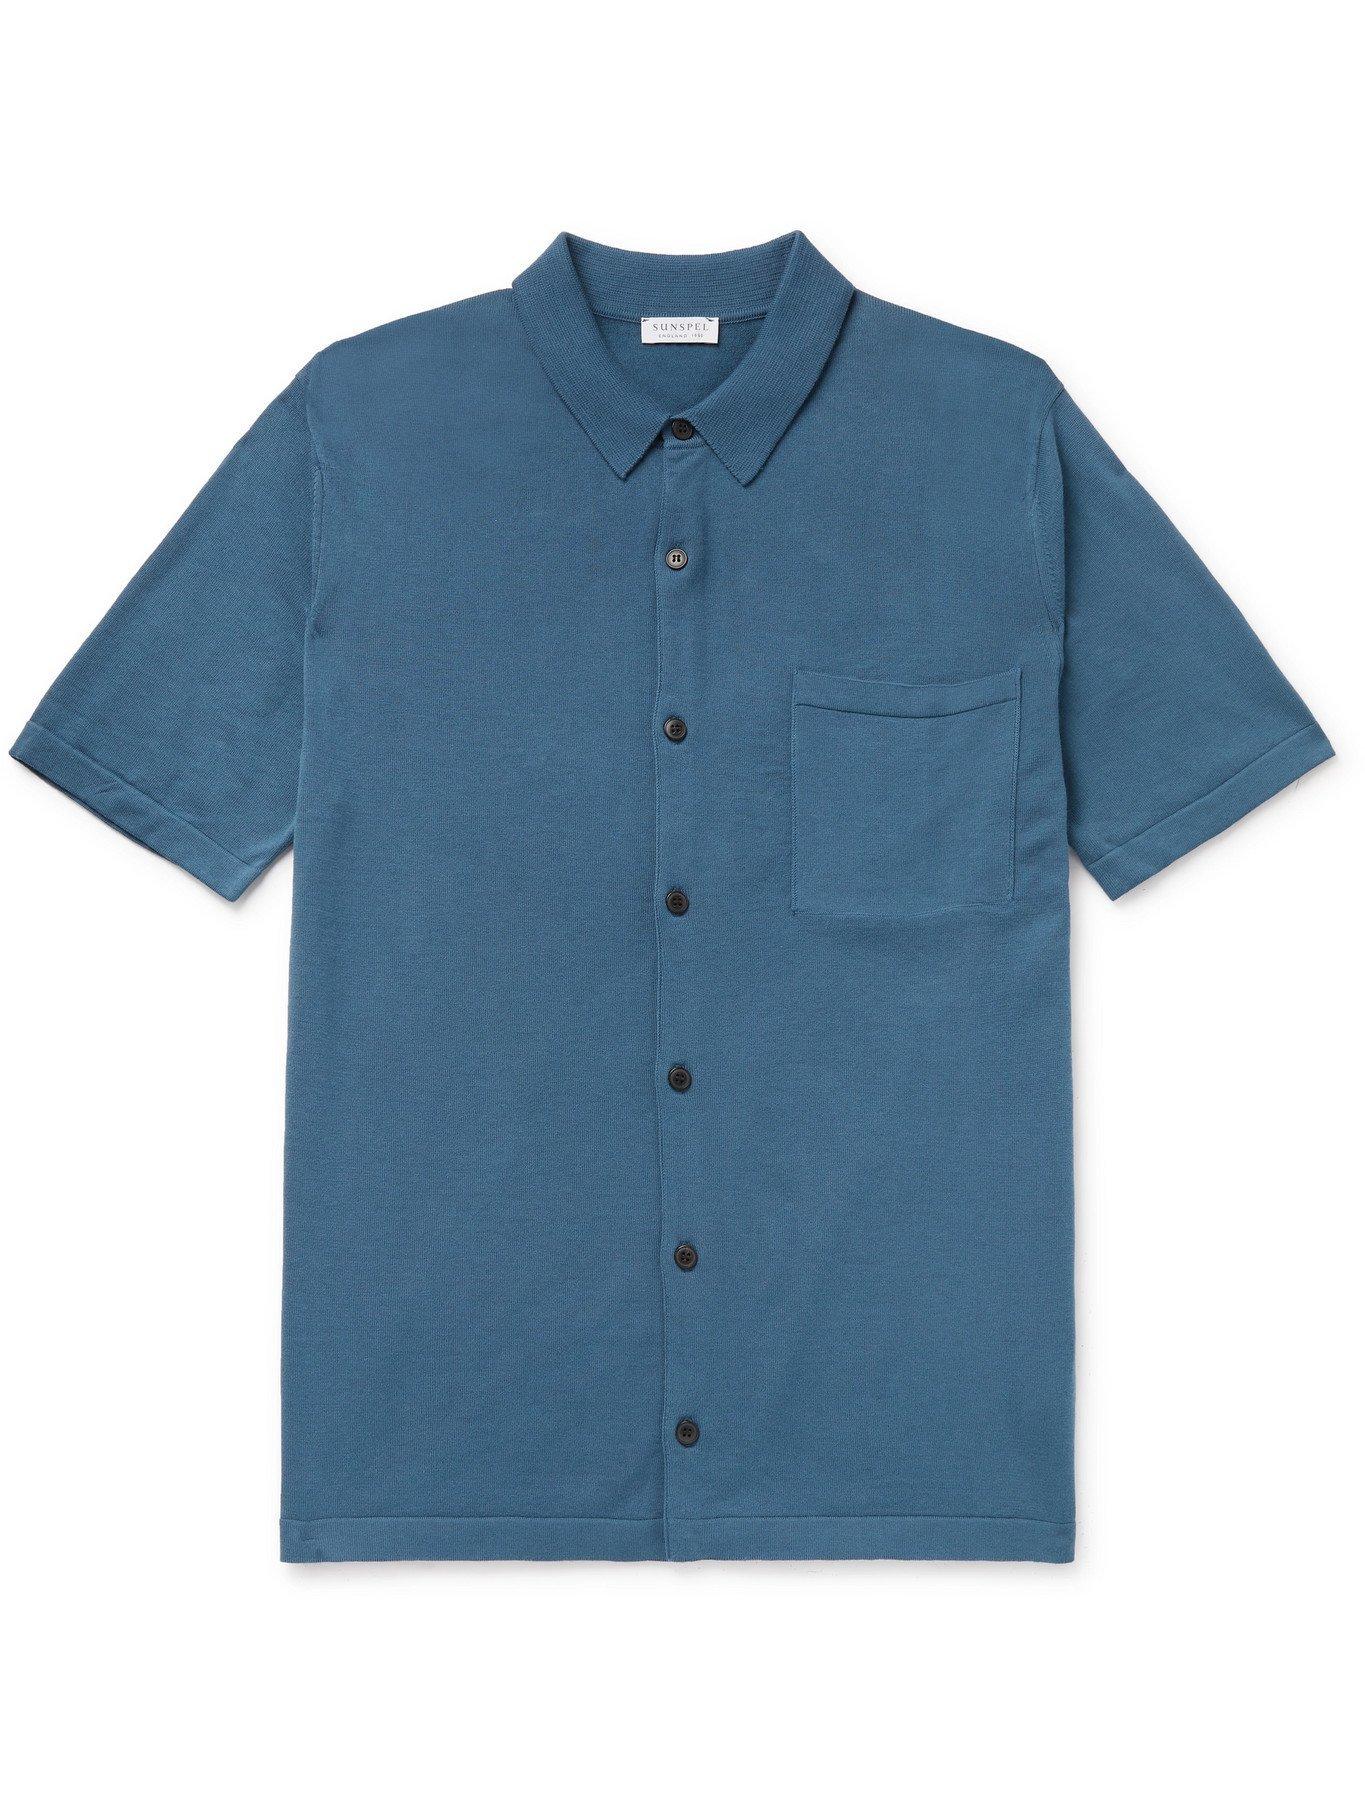 SUNSPEL - Slim-Fit Sea Island Cotton-Jersey Shirt - Blue - M